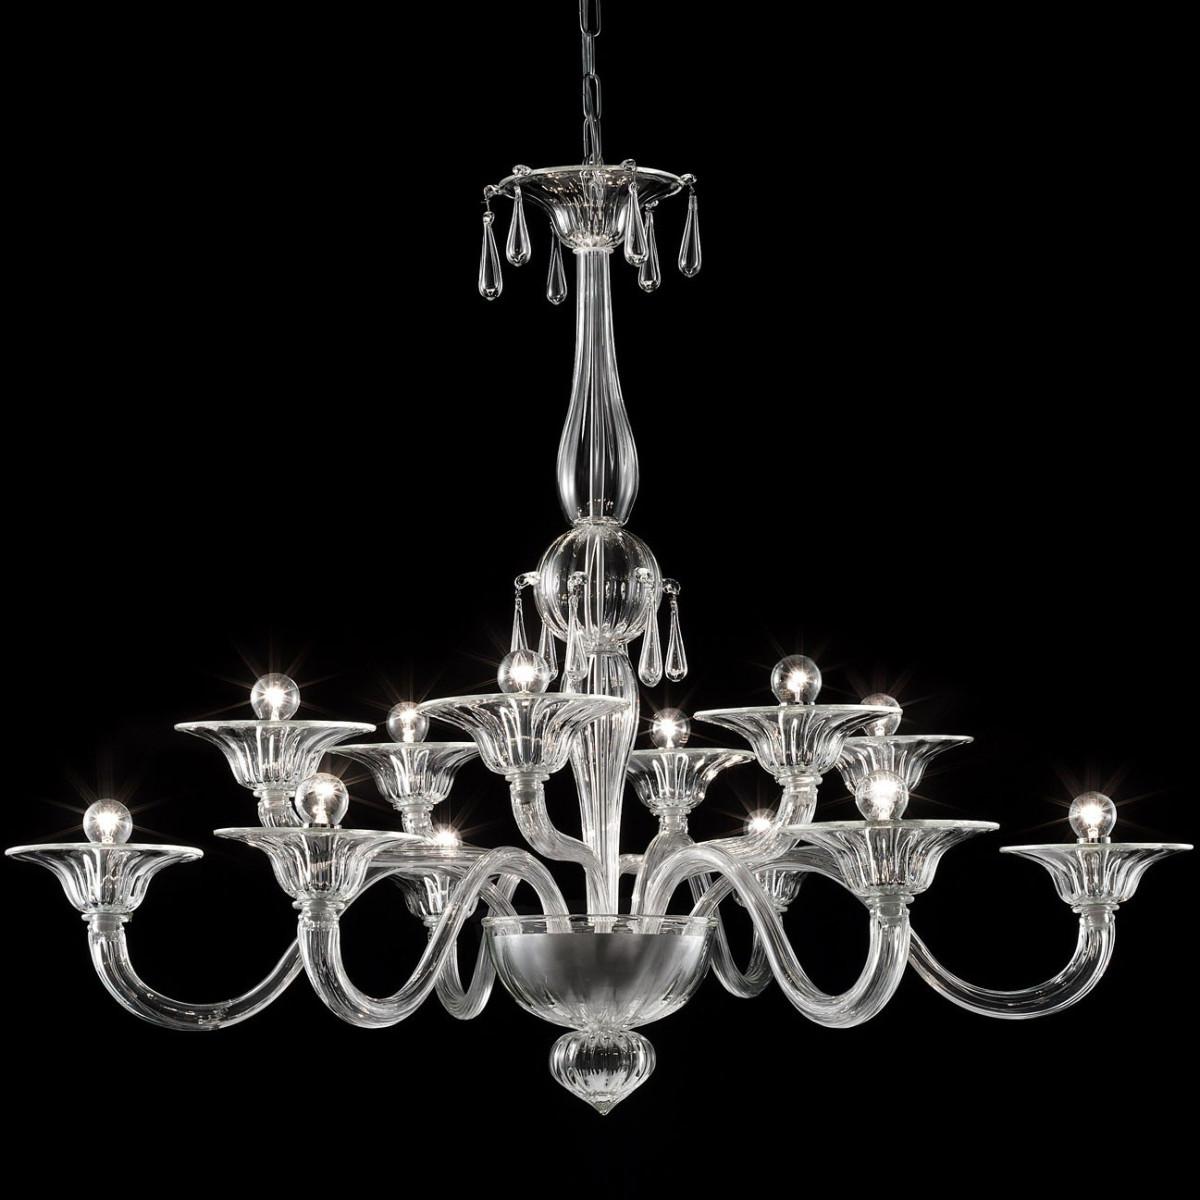 """Gioia"" Murano glass chandelier - 12 lights, transparent"